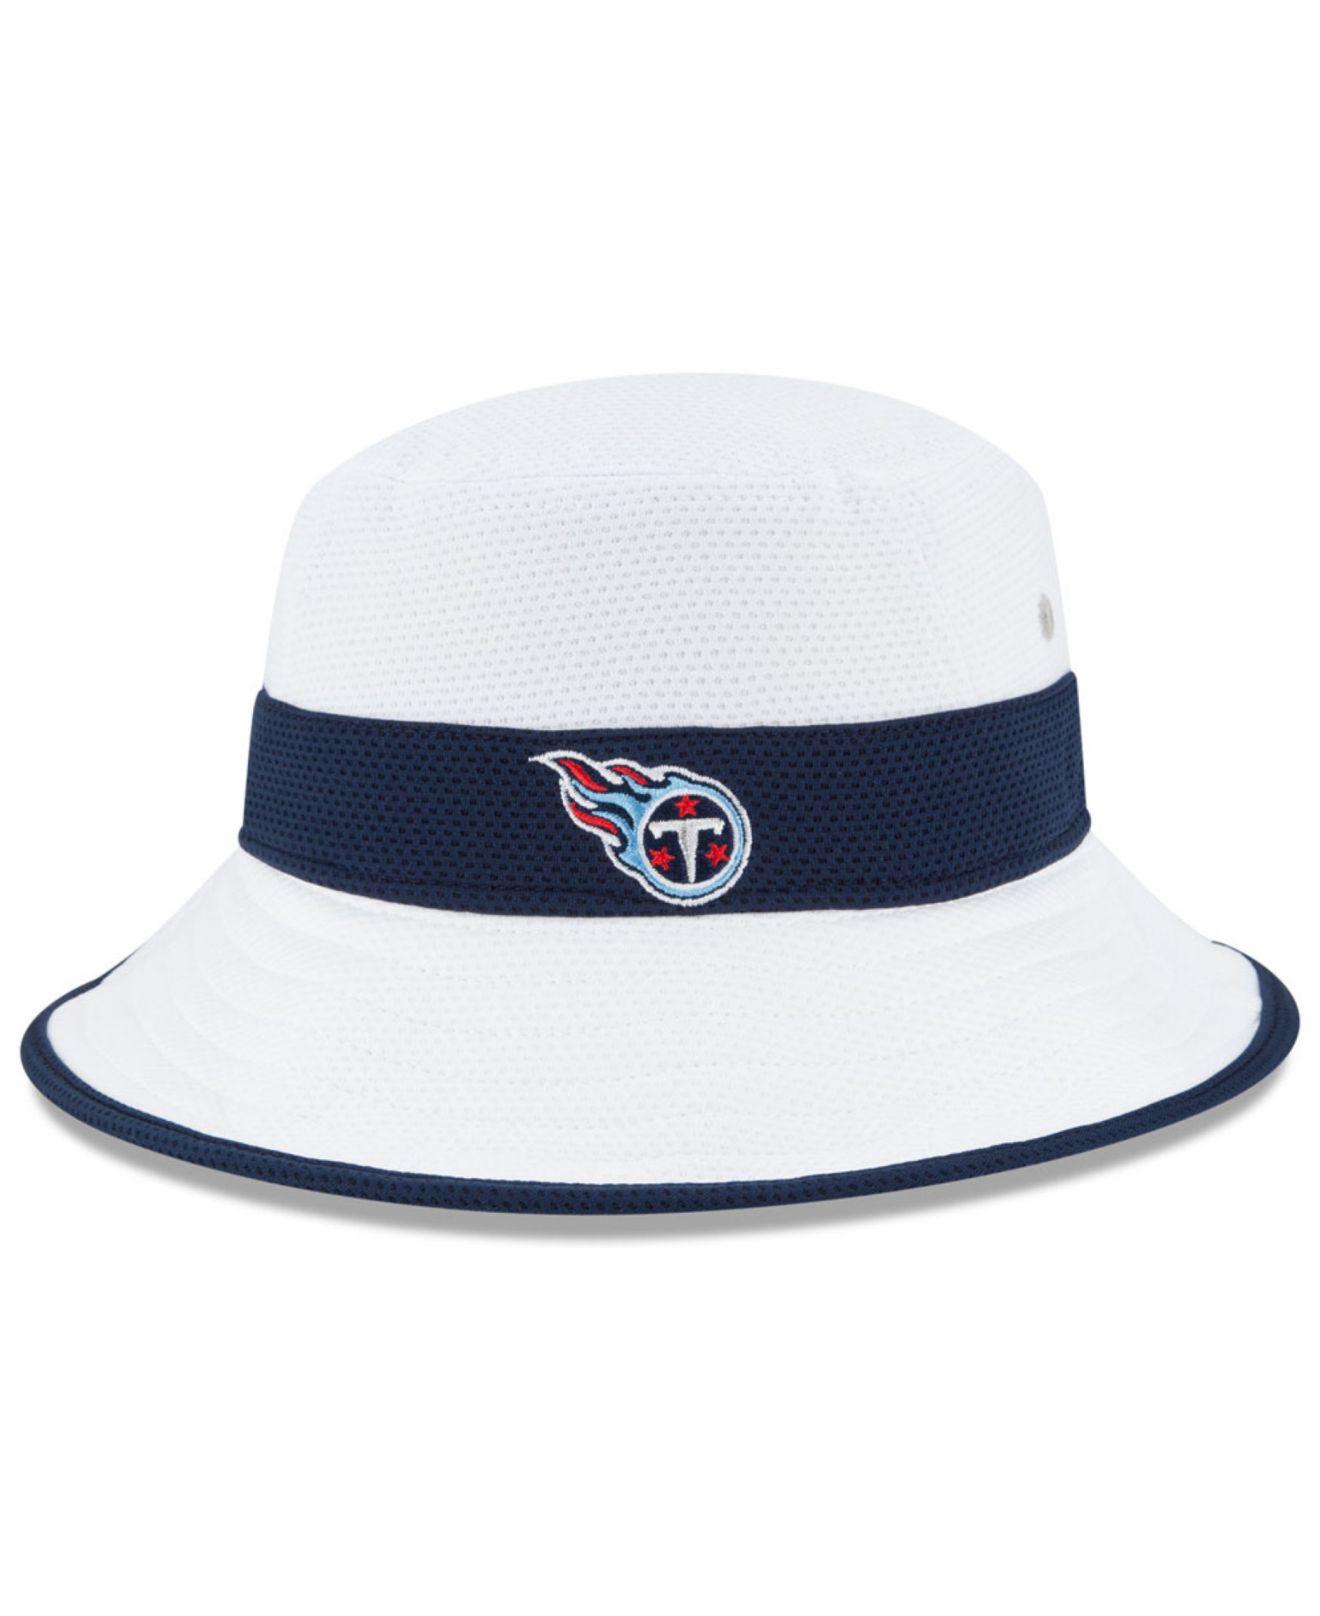 b504c84b309 Lyst - KTZ Tennessee Titans Training Camp Reverse Bucket Hat in ...